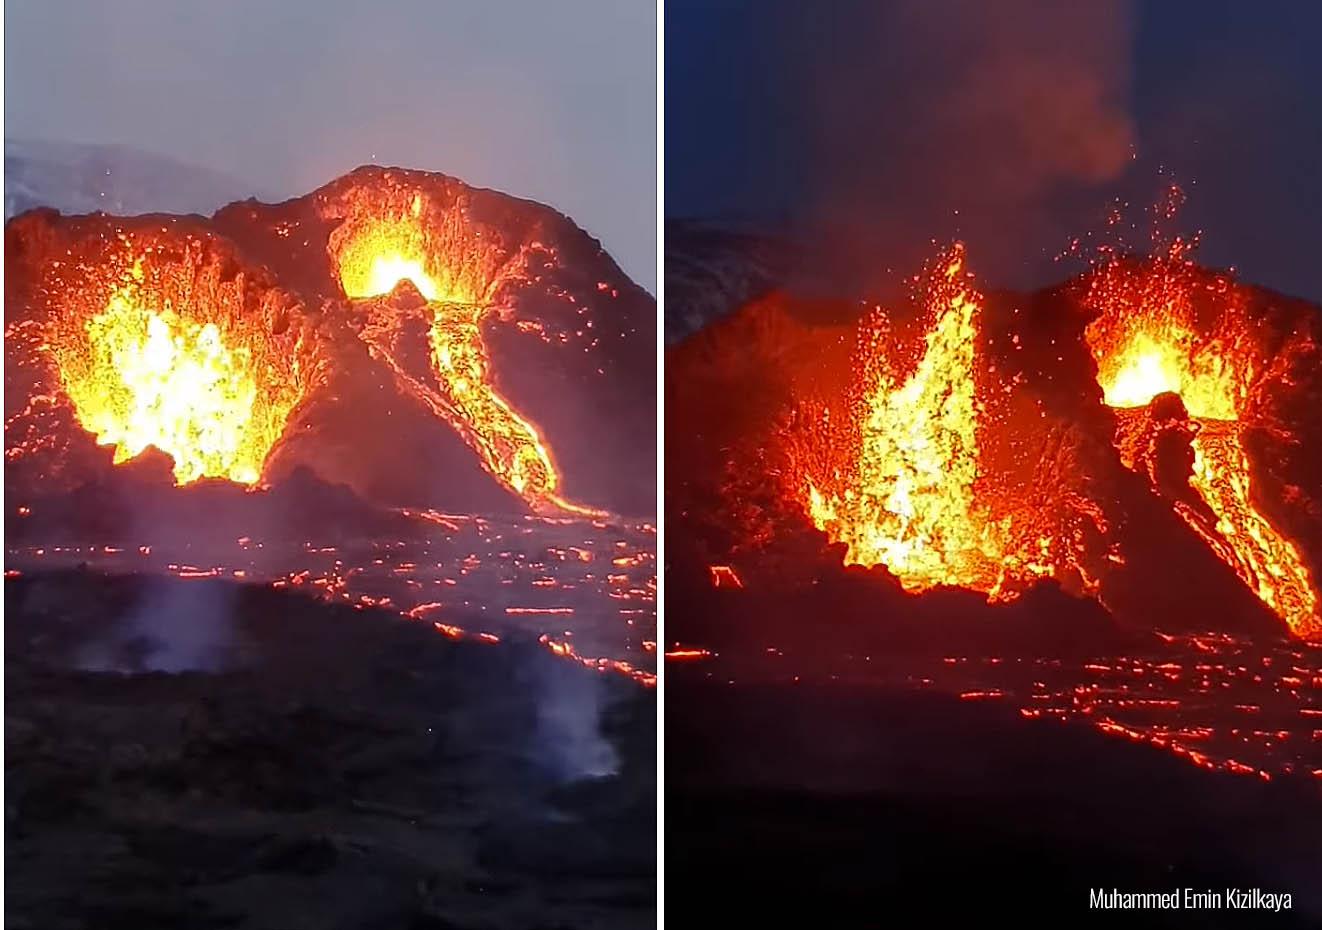 volcano-eruption-iceland-lava-fountain-muhammed-report